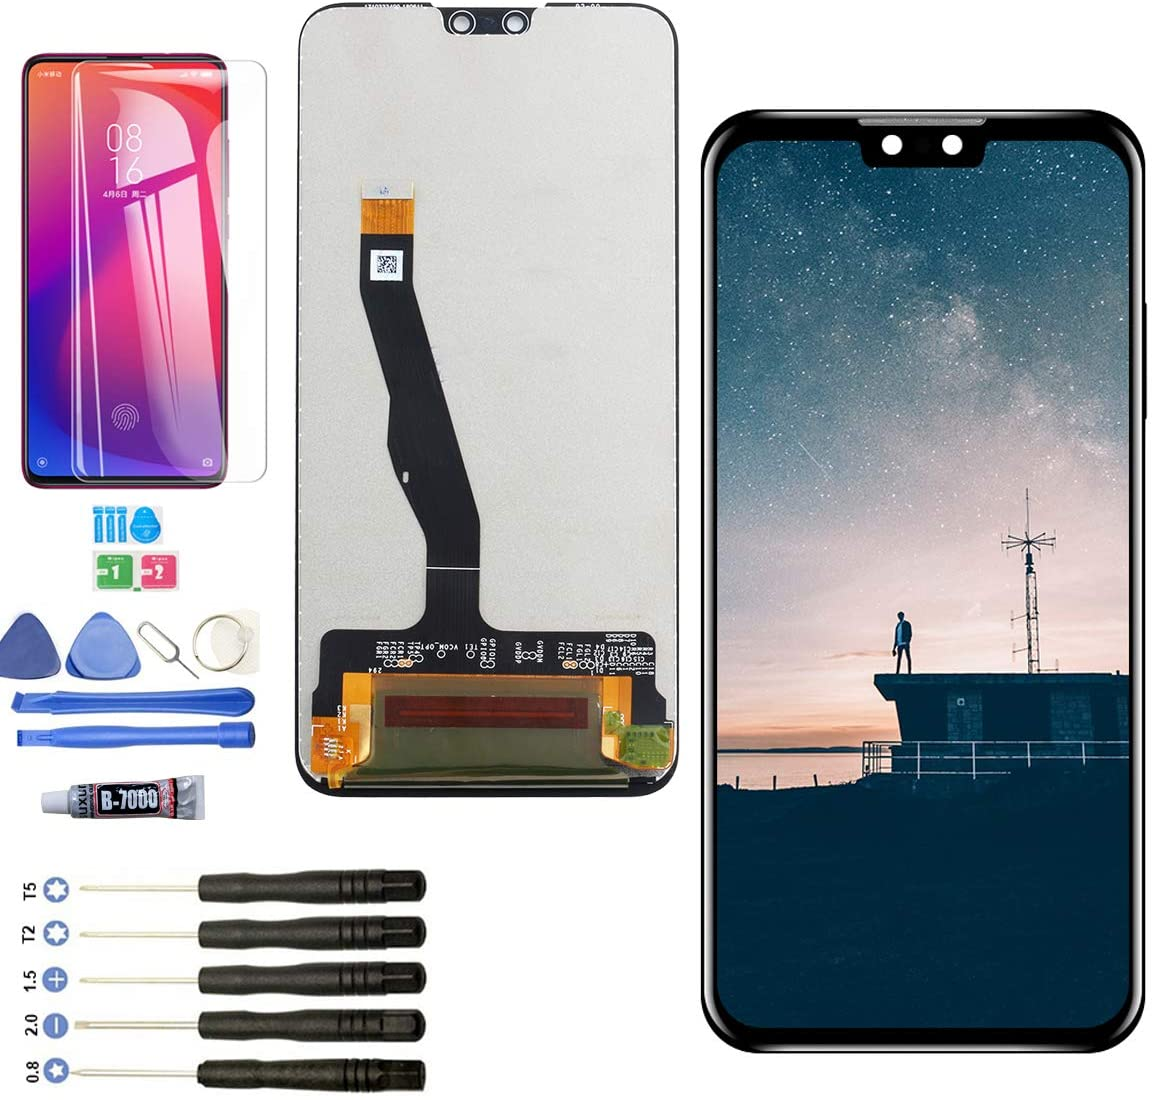 YWL-US LCD for Huawei Y9 2019 Replacement for Huawei Enjoy 9 Plus JKM-TL00 JKM-AL00 JKM-LX1 JKM-LX2 JKM-LX3 LCD Display Touch Screen Digitizer(Black)